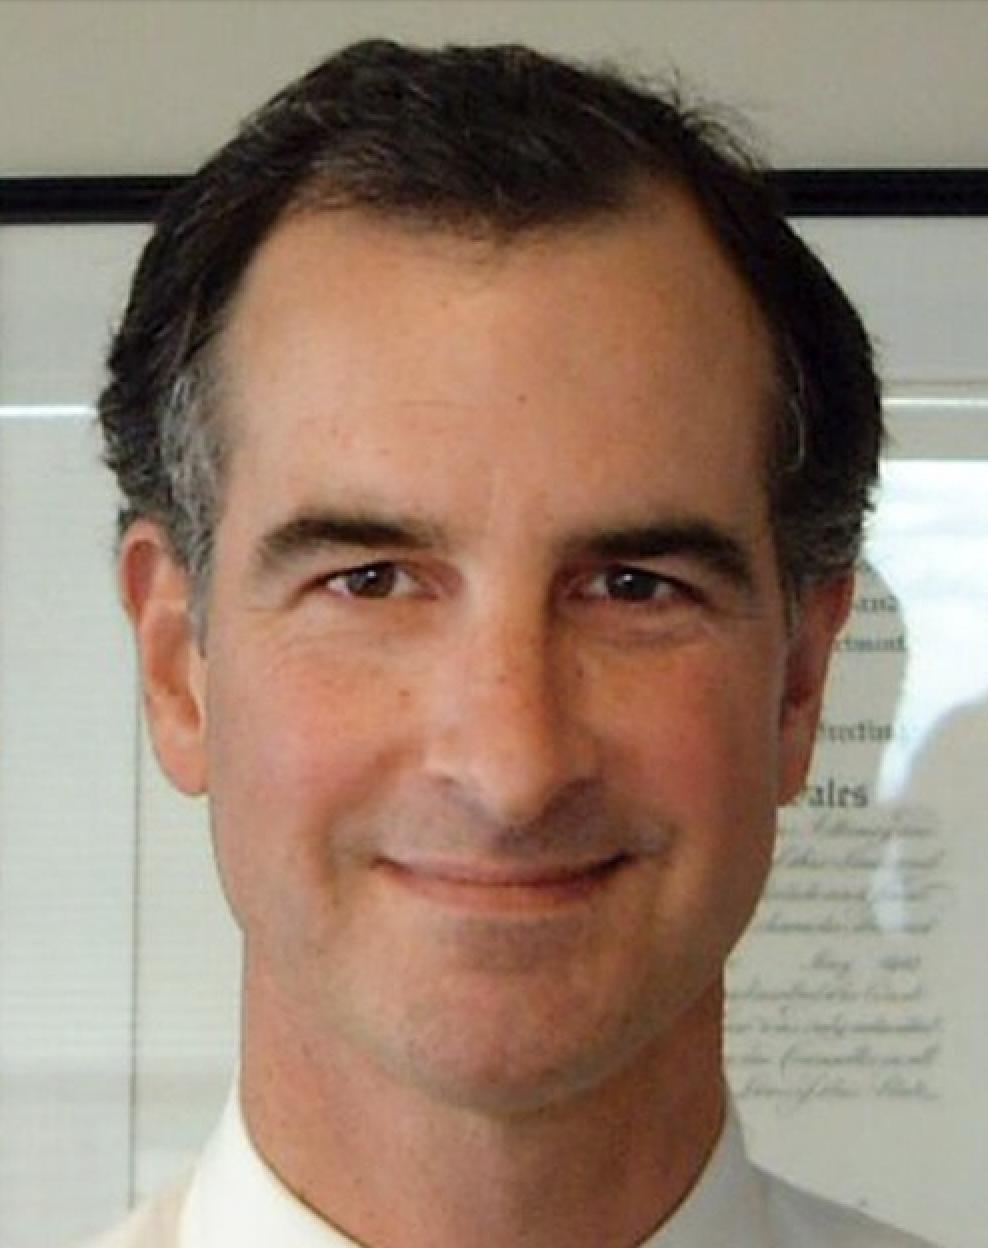 Assistant U.S. Attorney Thomas Wales